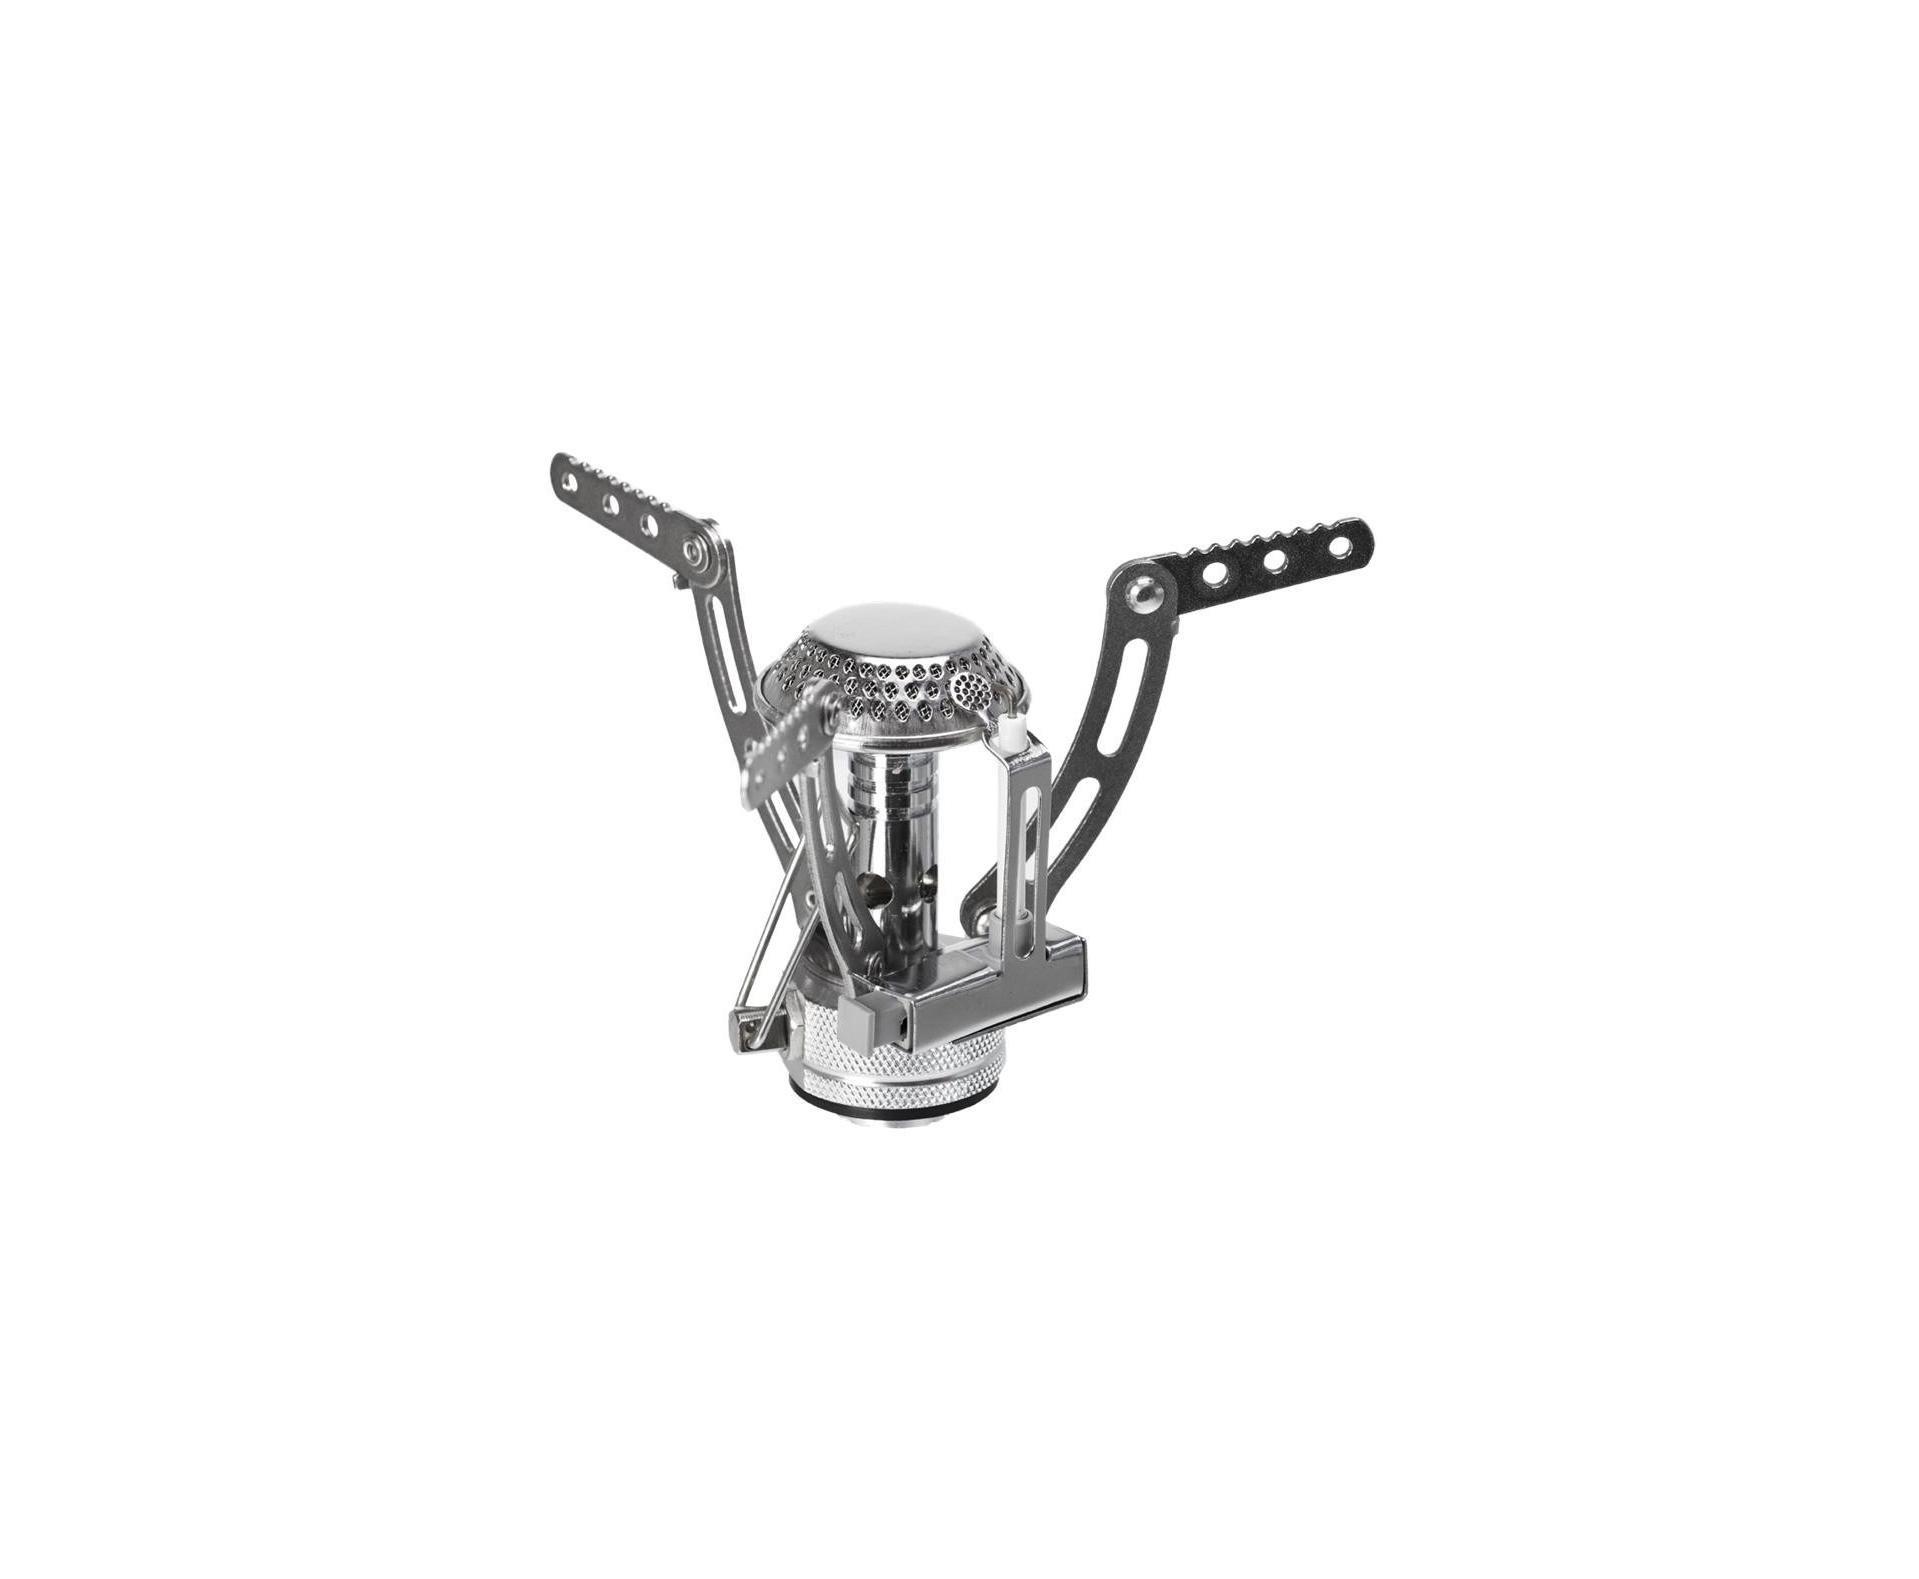 Mini Fogareiro Compact Inox - Guepardo